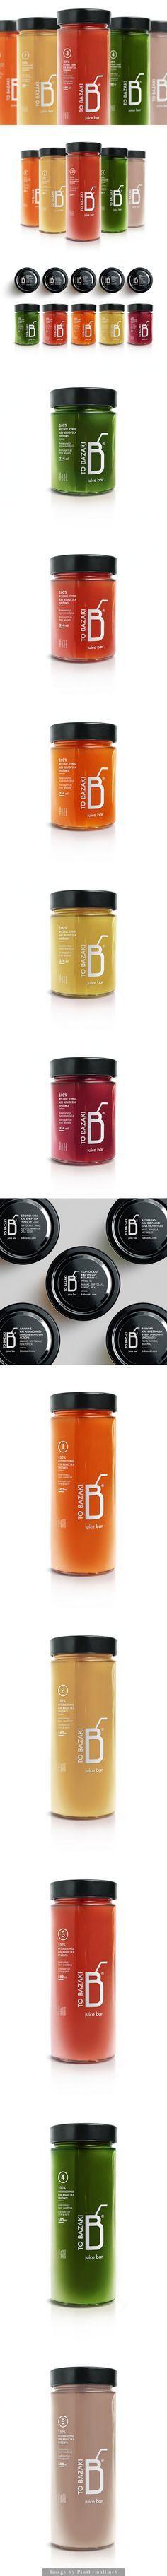 TO BAZAKI - Designer: George Probonas - http://www.packagingoftheworld.com/2014/10/to-bazaki.html PD